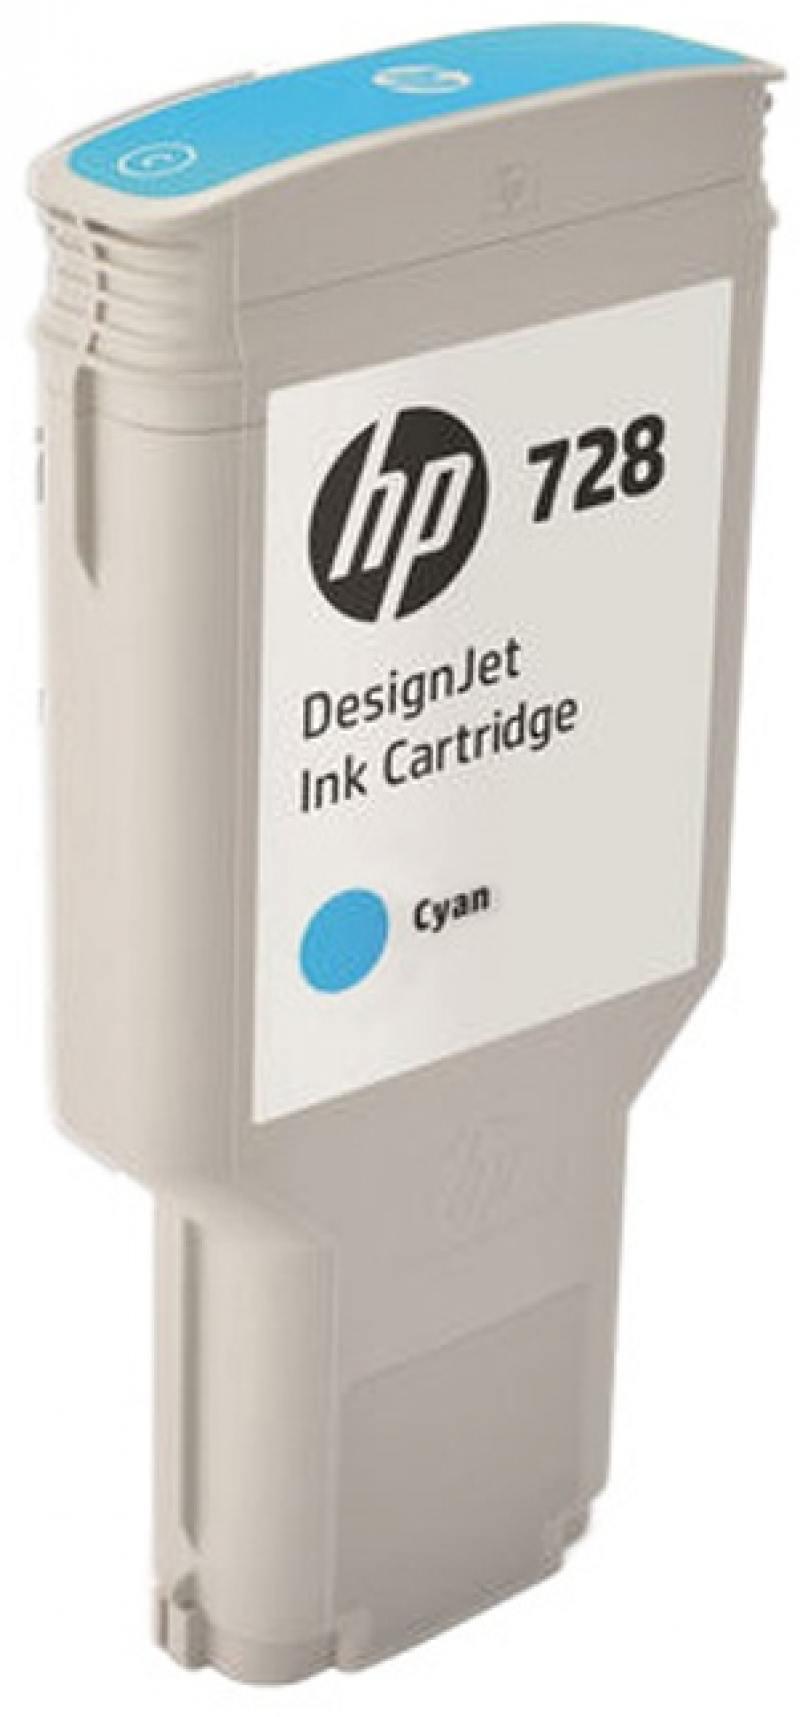 Картридж HP F9K17A (HP 728) для DesignJet T730, T830. Голубой. 300 мл. hp designjet t830 36 f9a30a